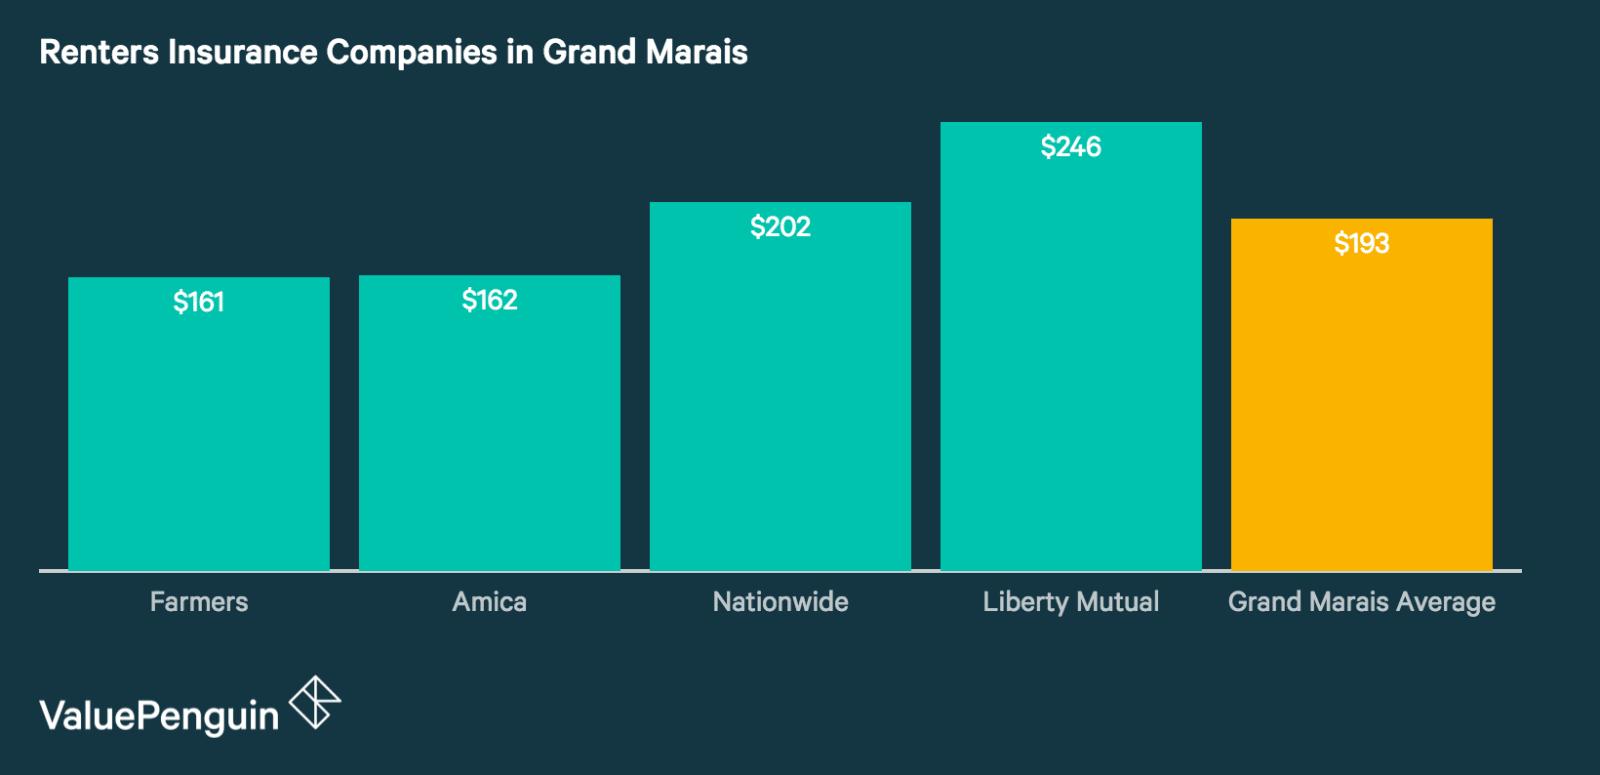 Best Renters Insurance Companies in Grand Marais